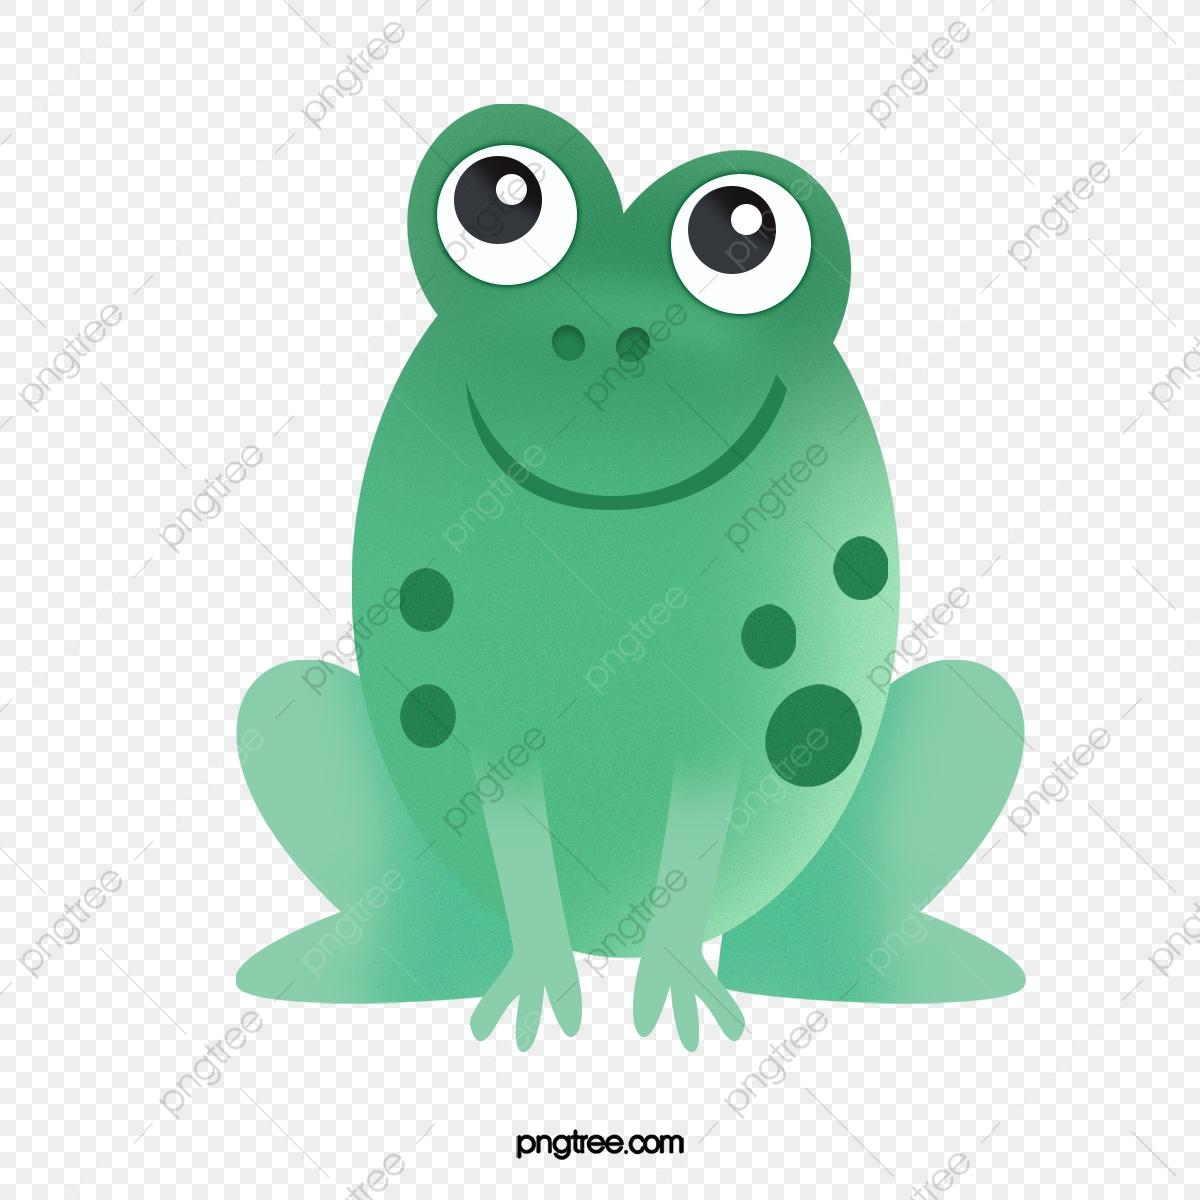 Animation png transparent image. Frog clipart file